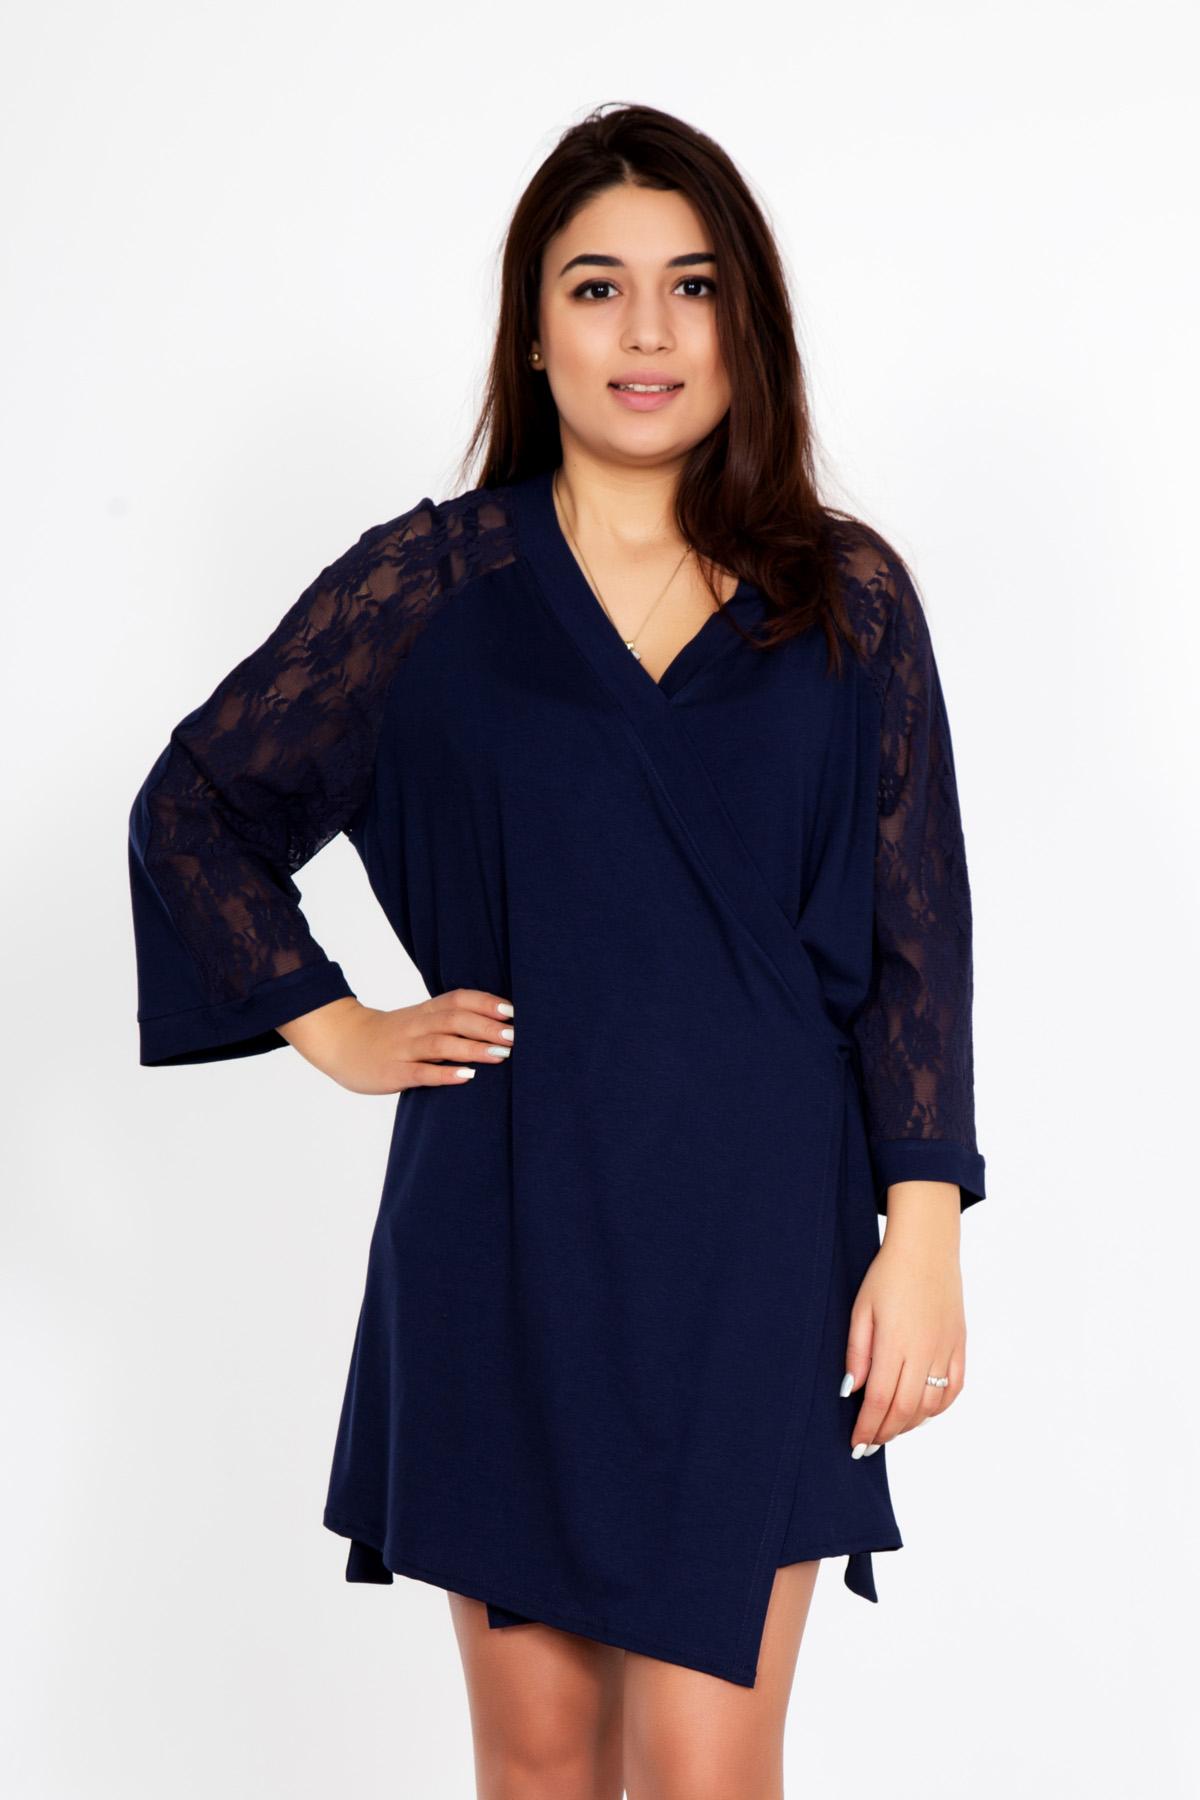 Жен. комплект  Амин  Темно-синий р. 44 - Женская одежда артикул: 23479